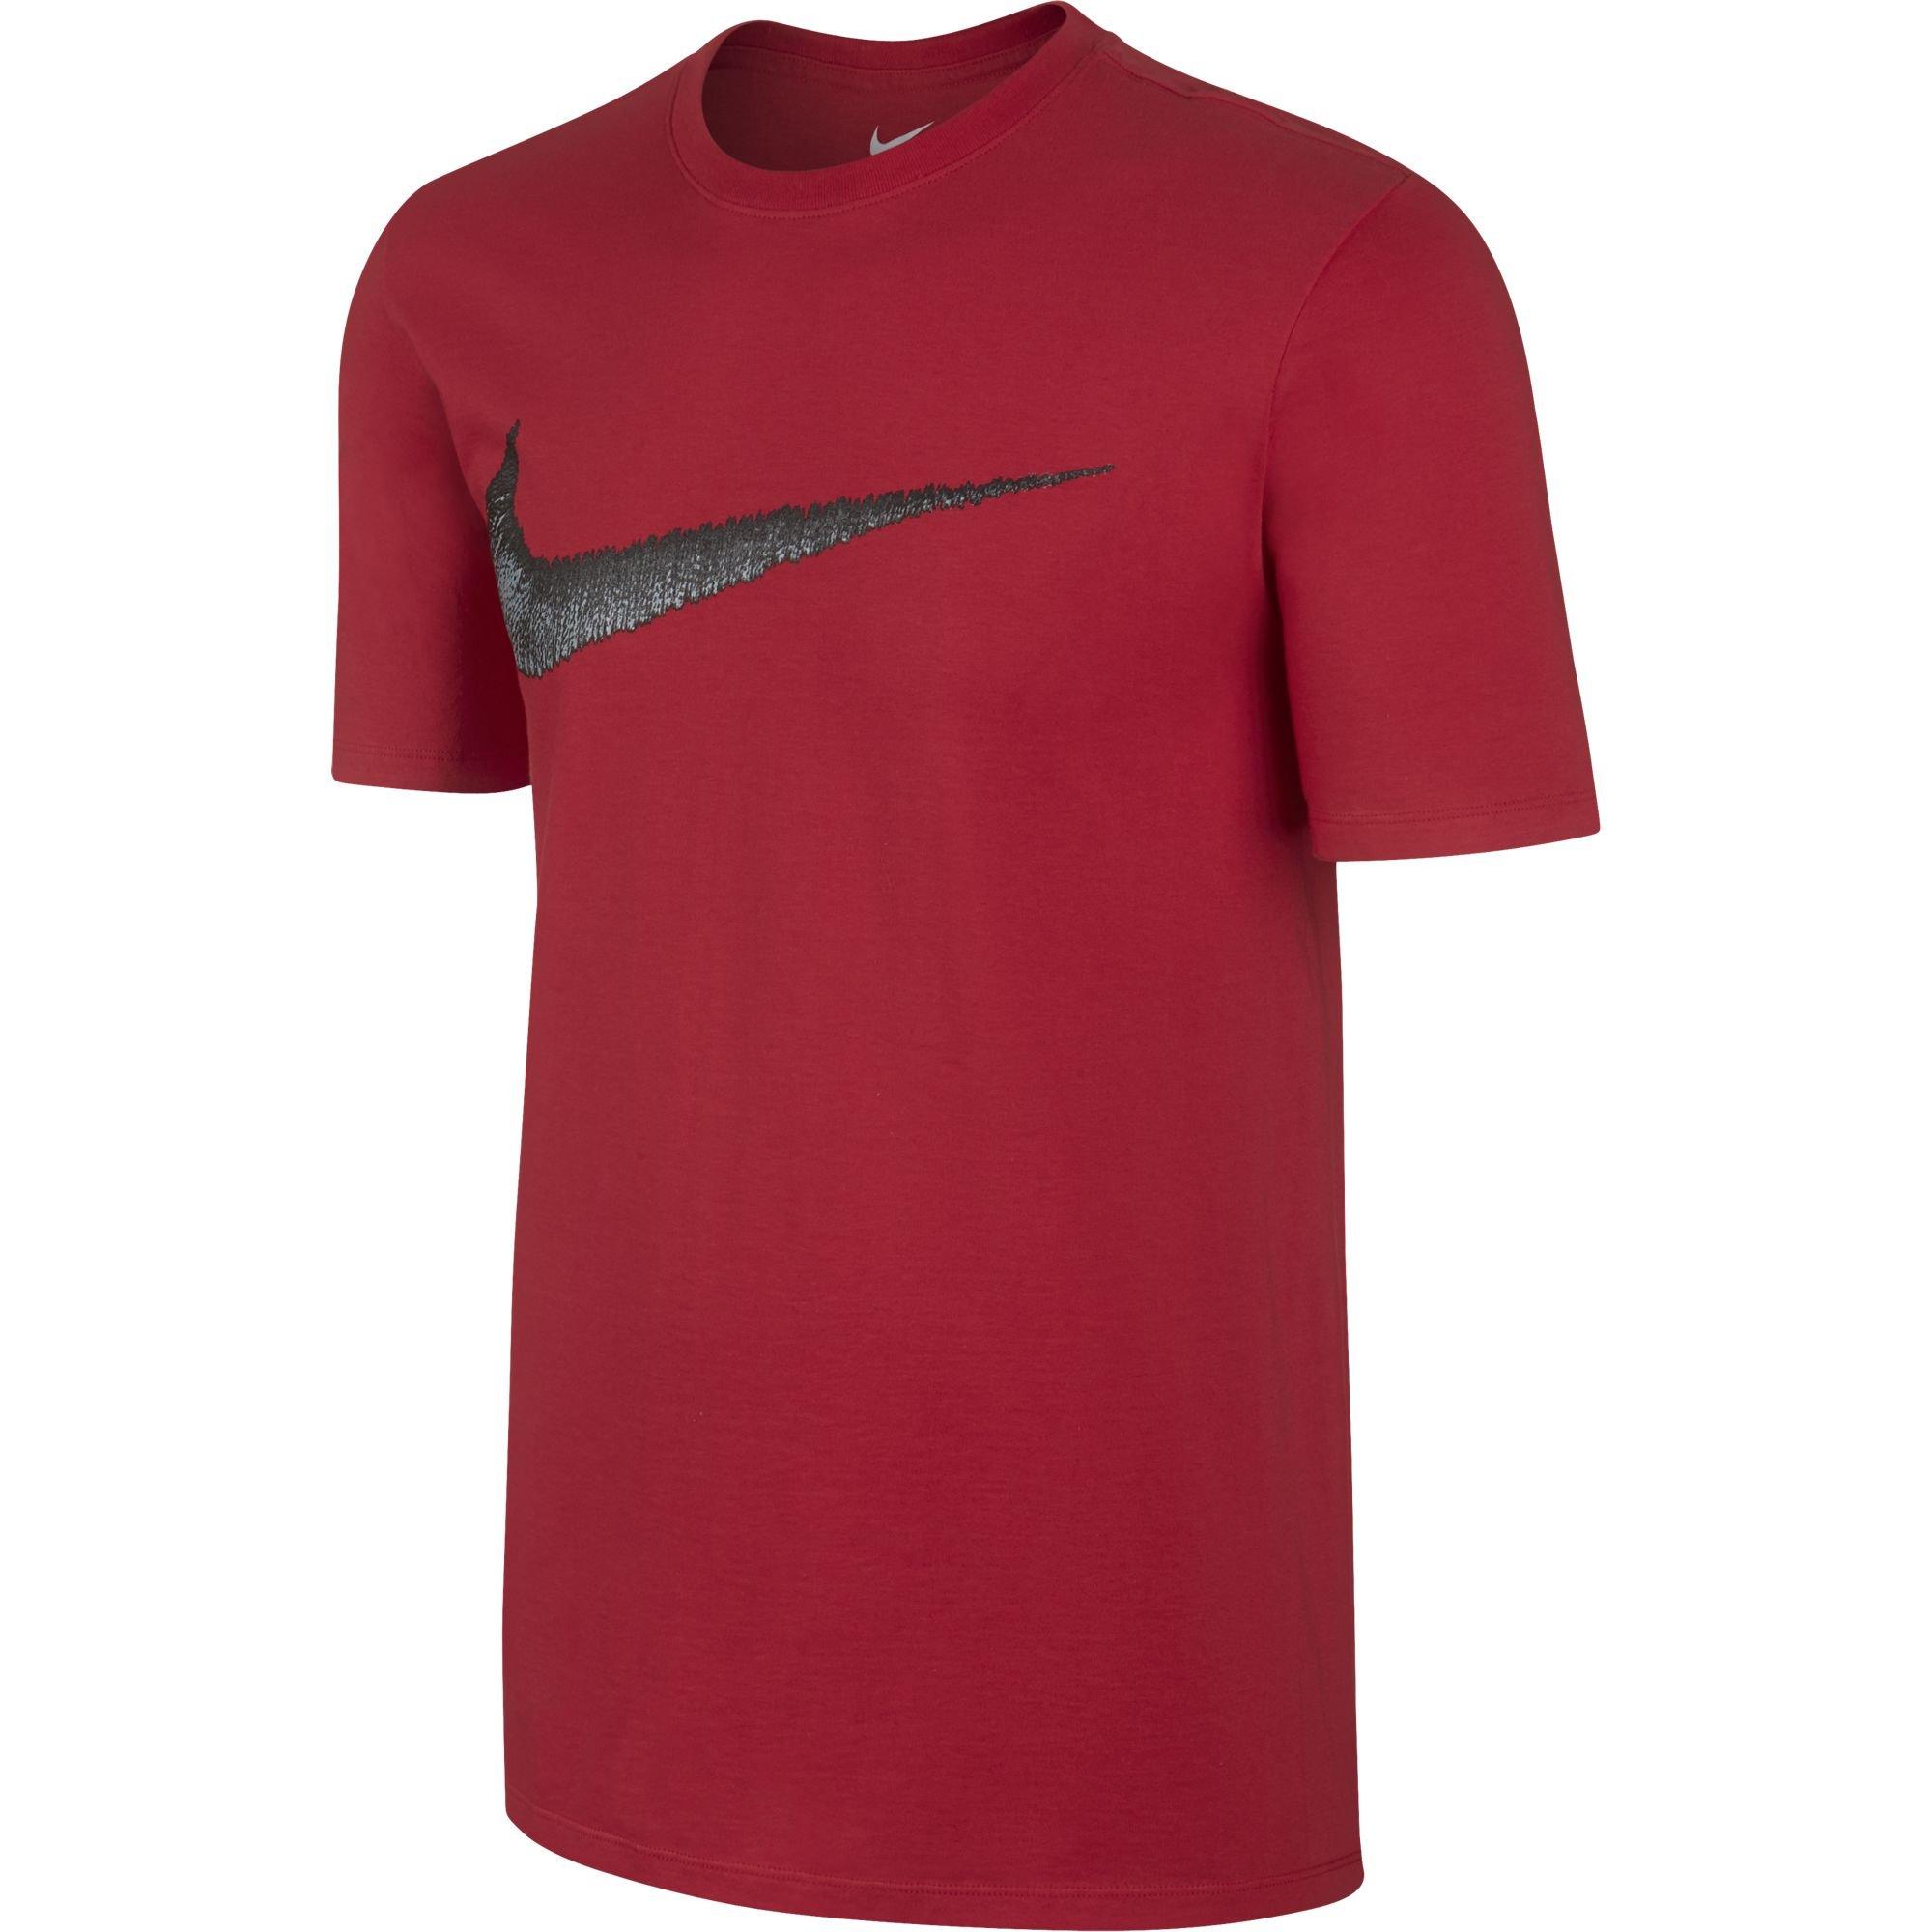 NIKE Sportswear Men's Hangtag Swoosh Tee, University Red/Anthracite, X-Small